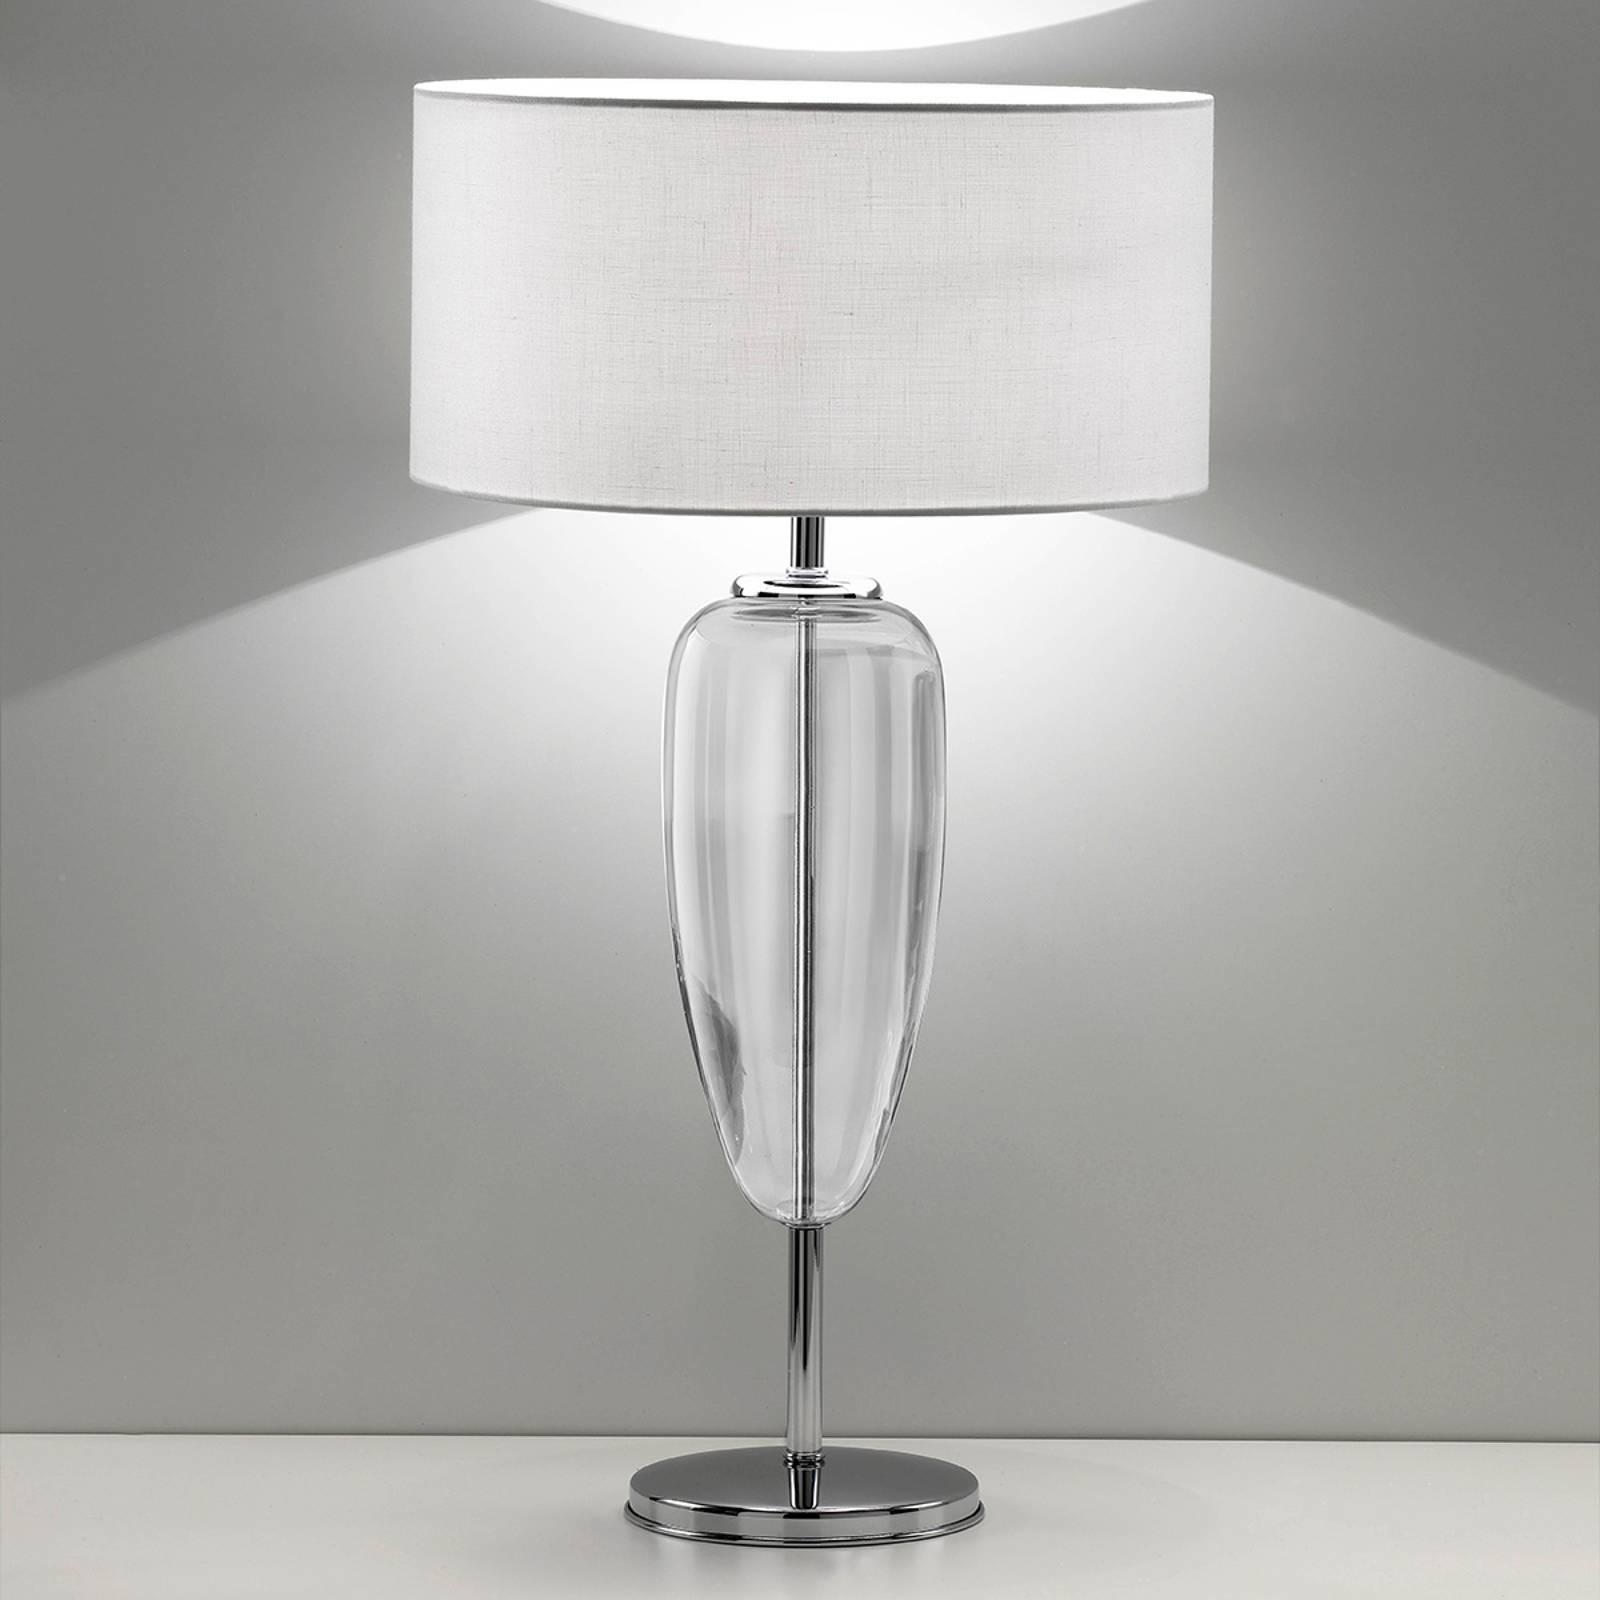 Pöytälamppu Show Ogiva 82 cm lasielementti kirkas